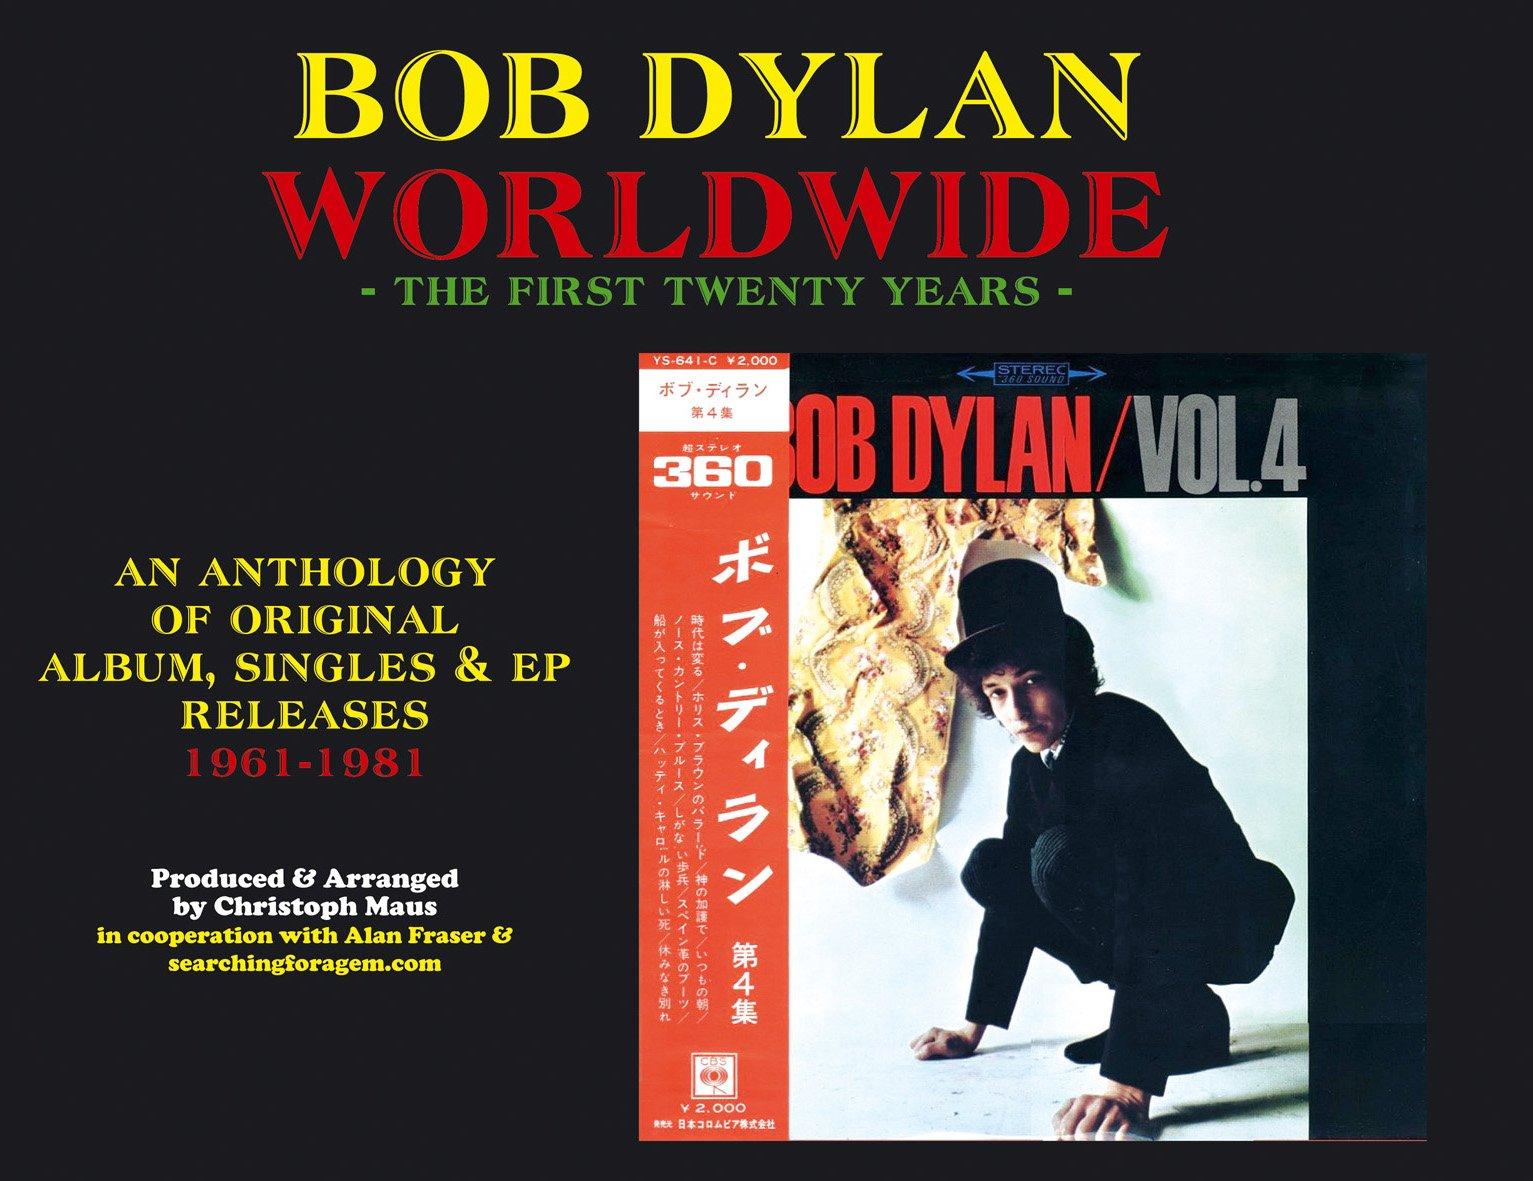 BOB DYLAN WORLDWIDE- The First Twenty Years